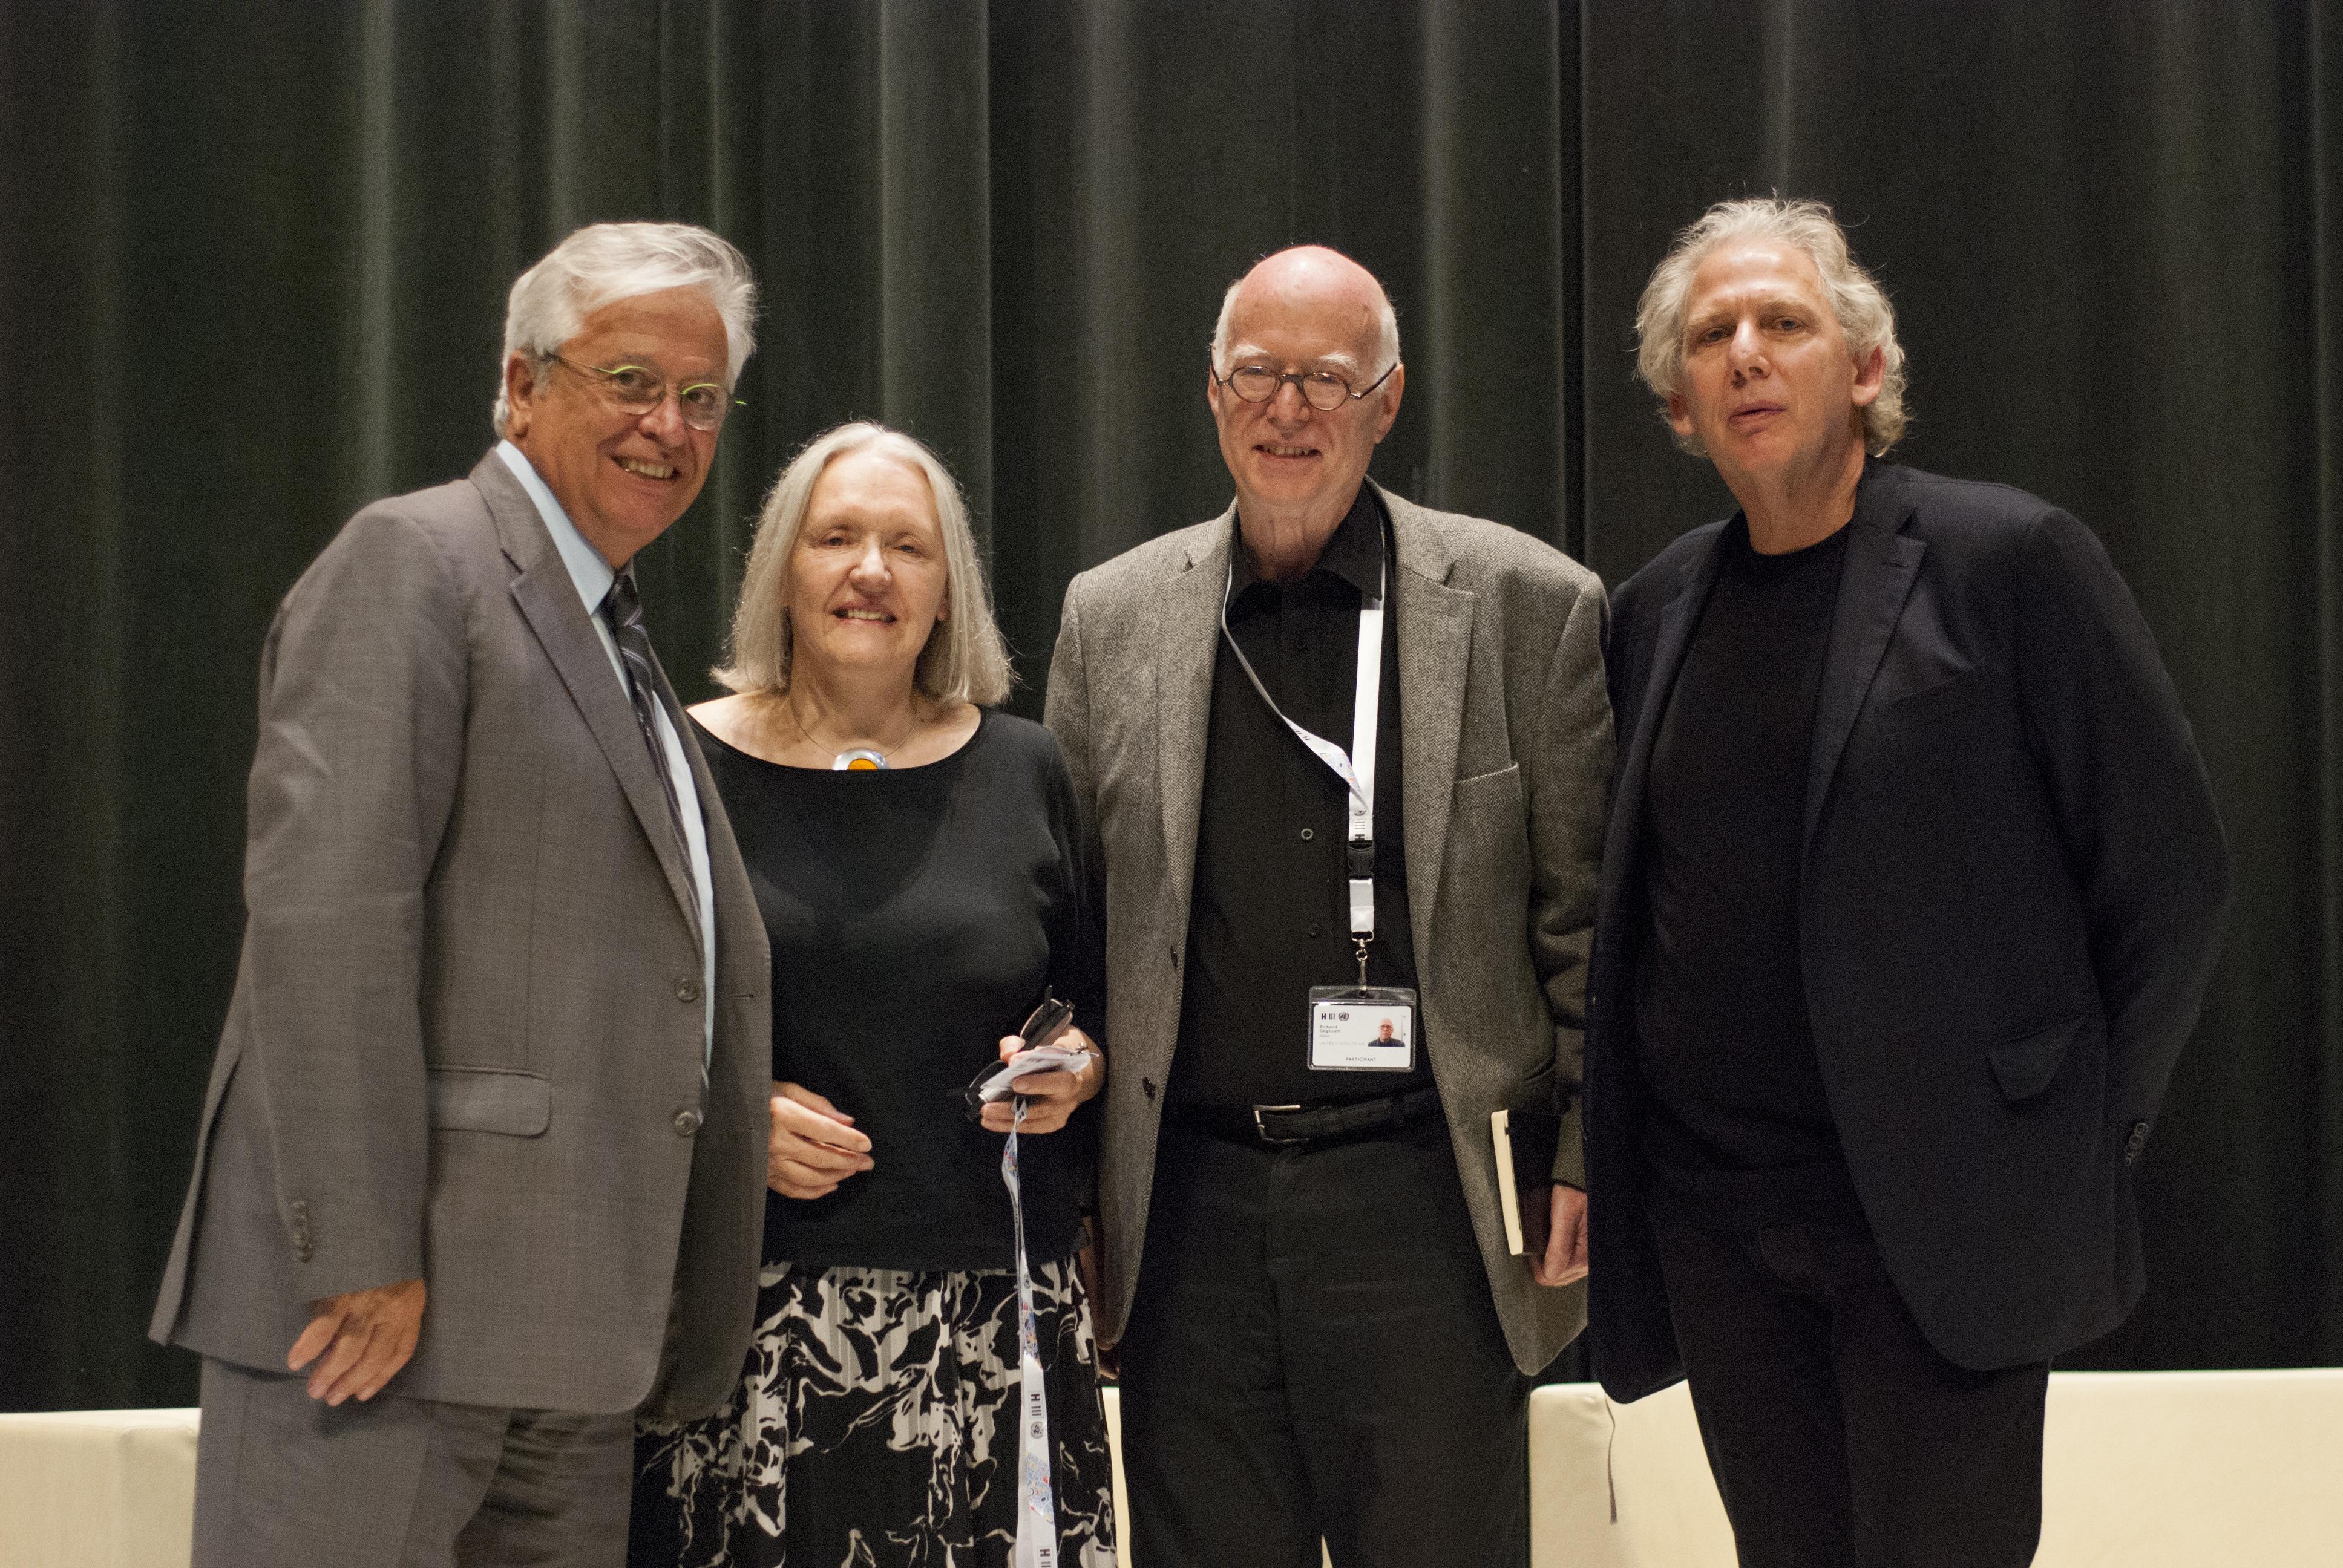 A partir da esquerda, Joan Clos, Saskia Sassen, Richard Sennett e Ricky Burdett (Foto: Secretariado do Habitat III)